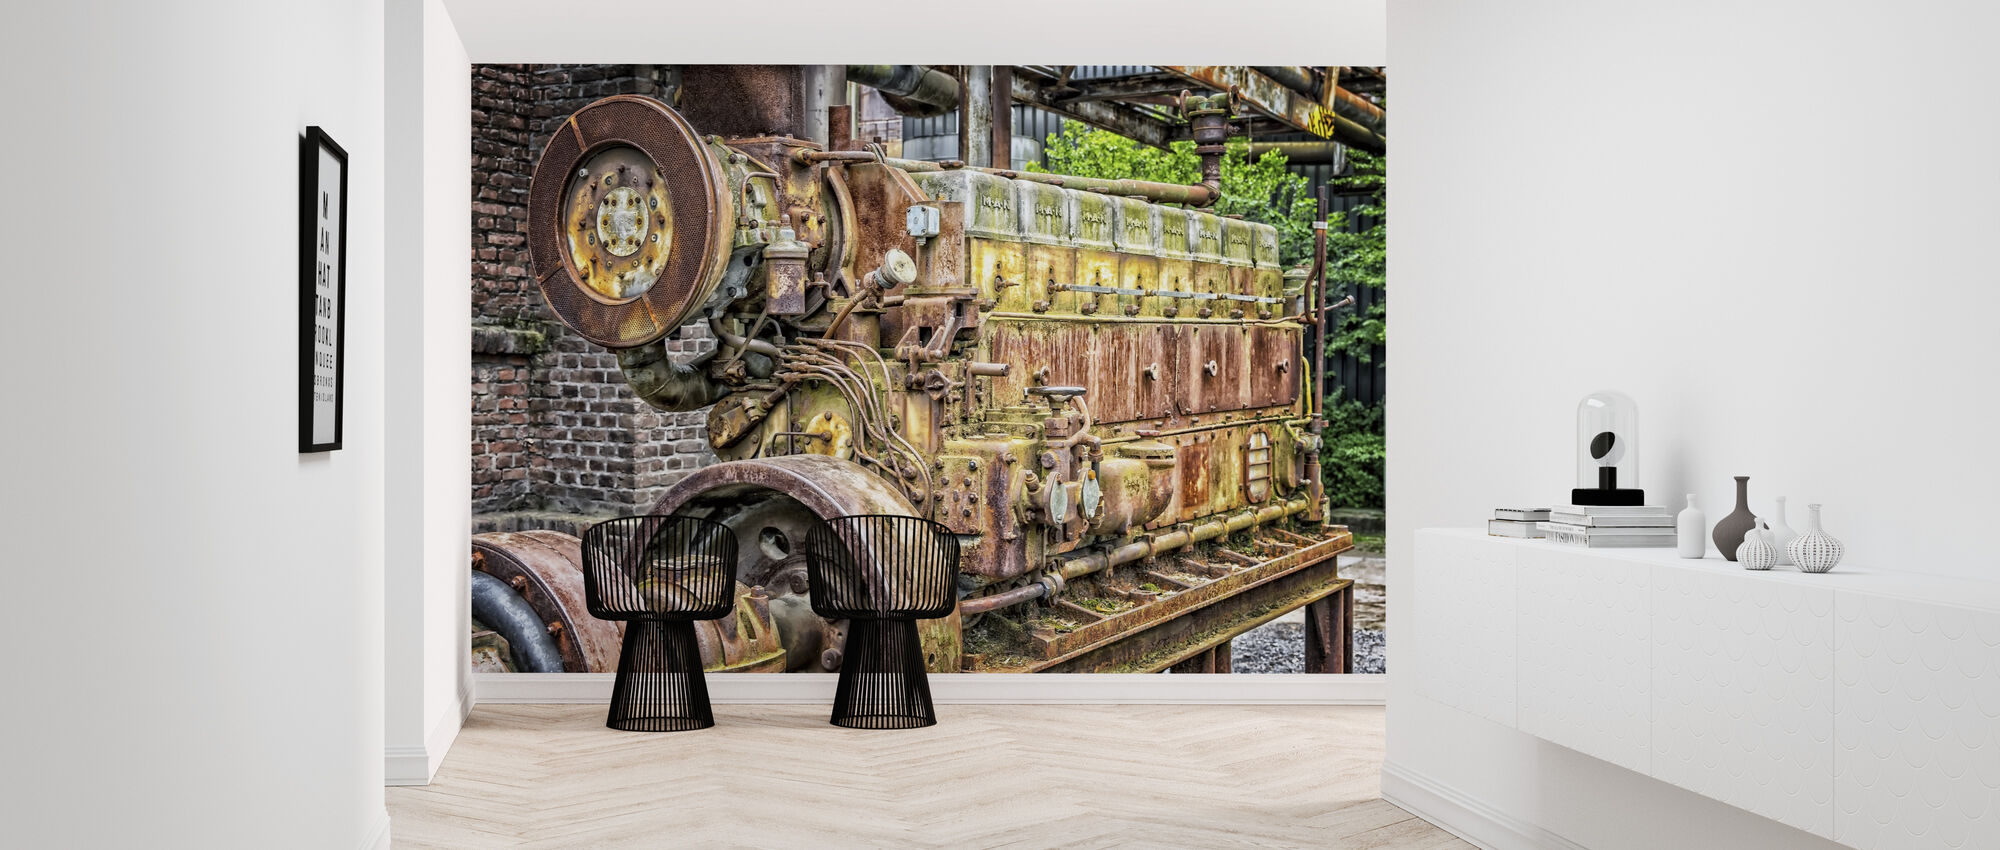 Rusty Machine Motor - Wallpaper - Hallway